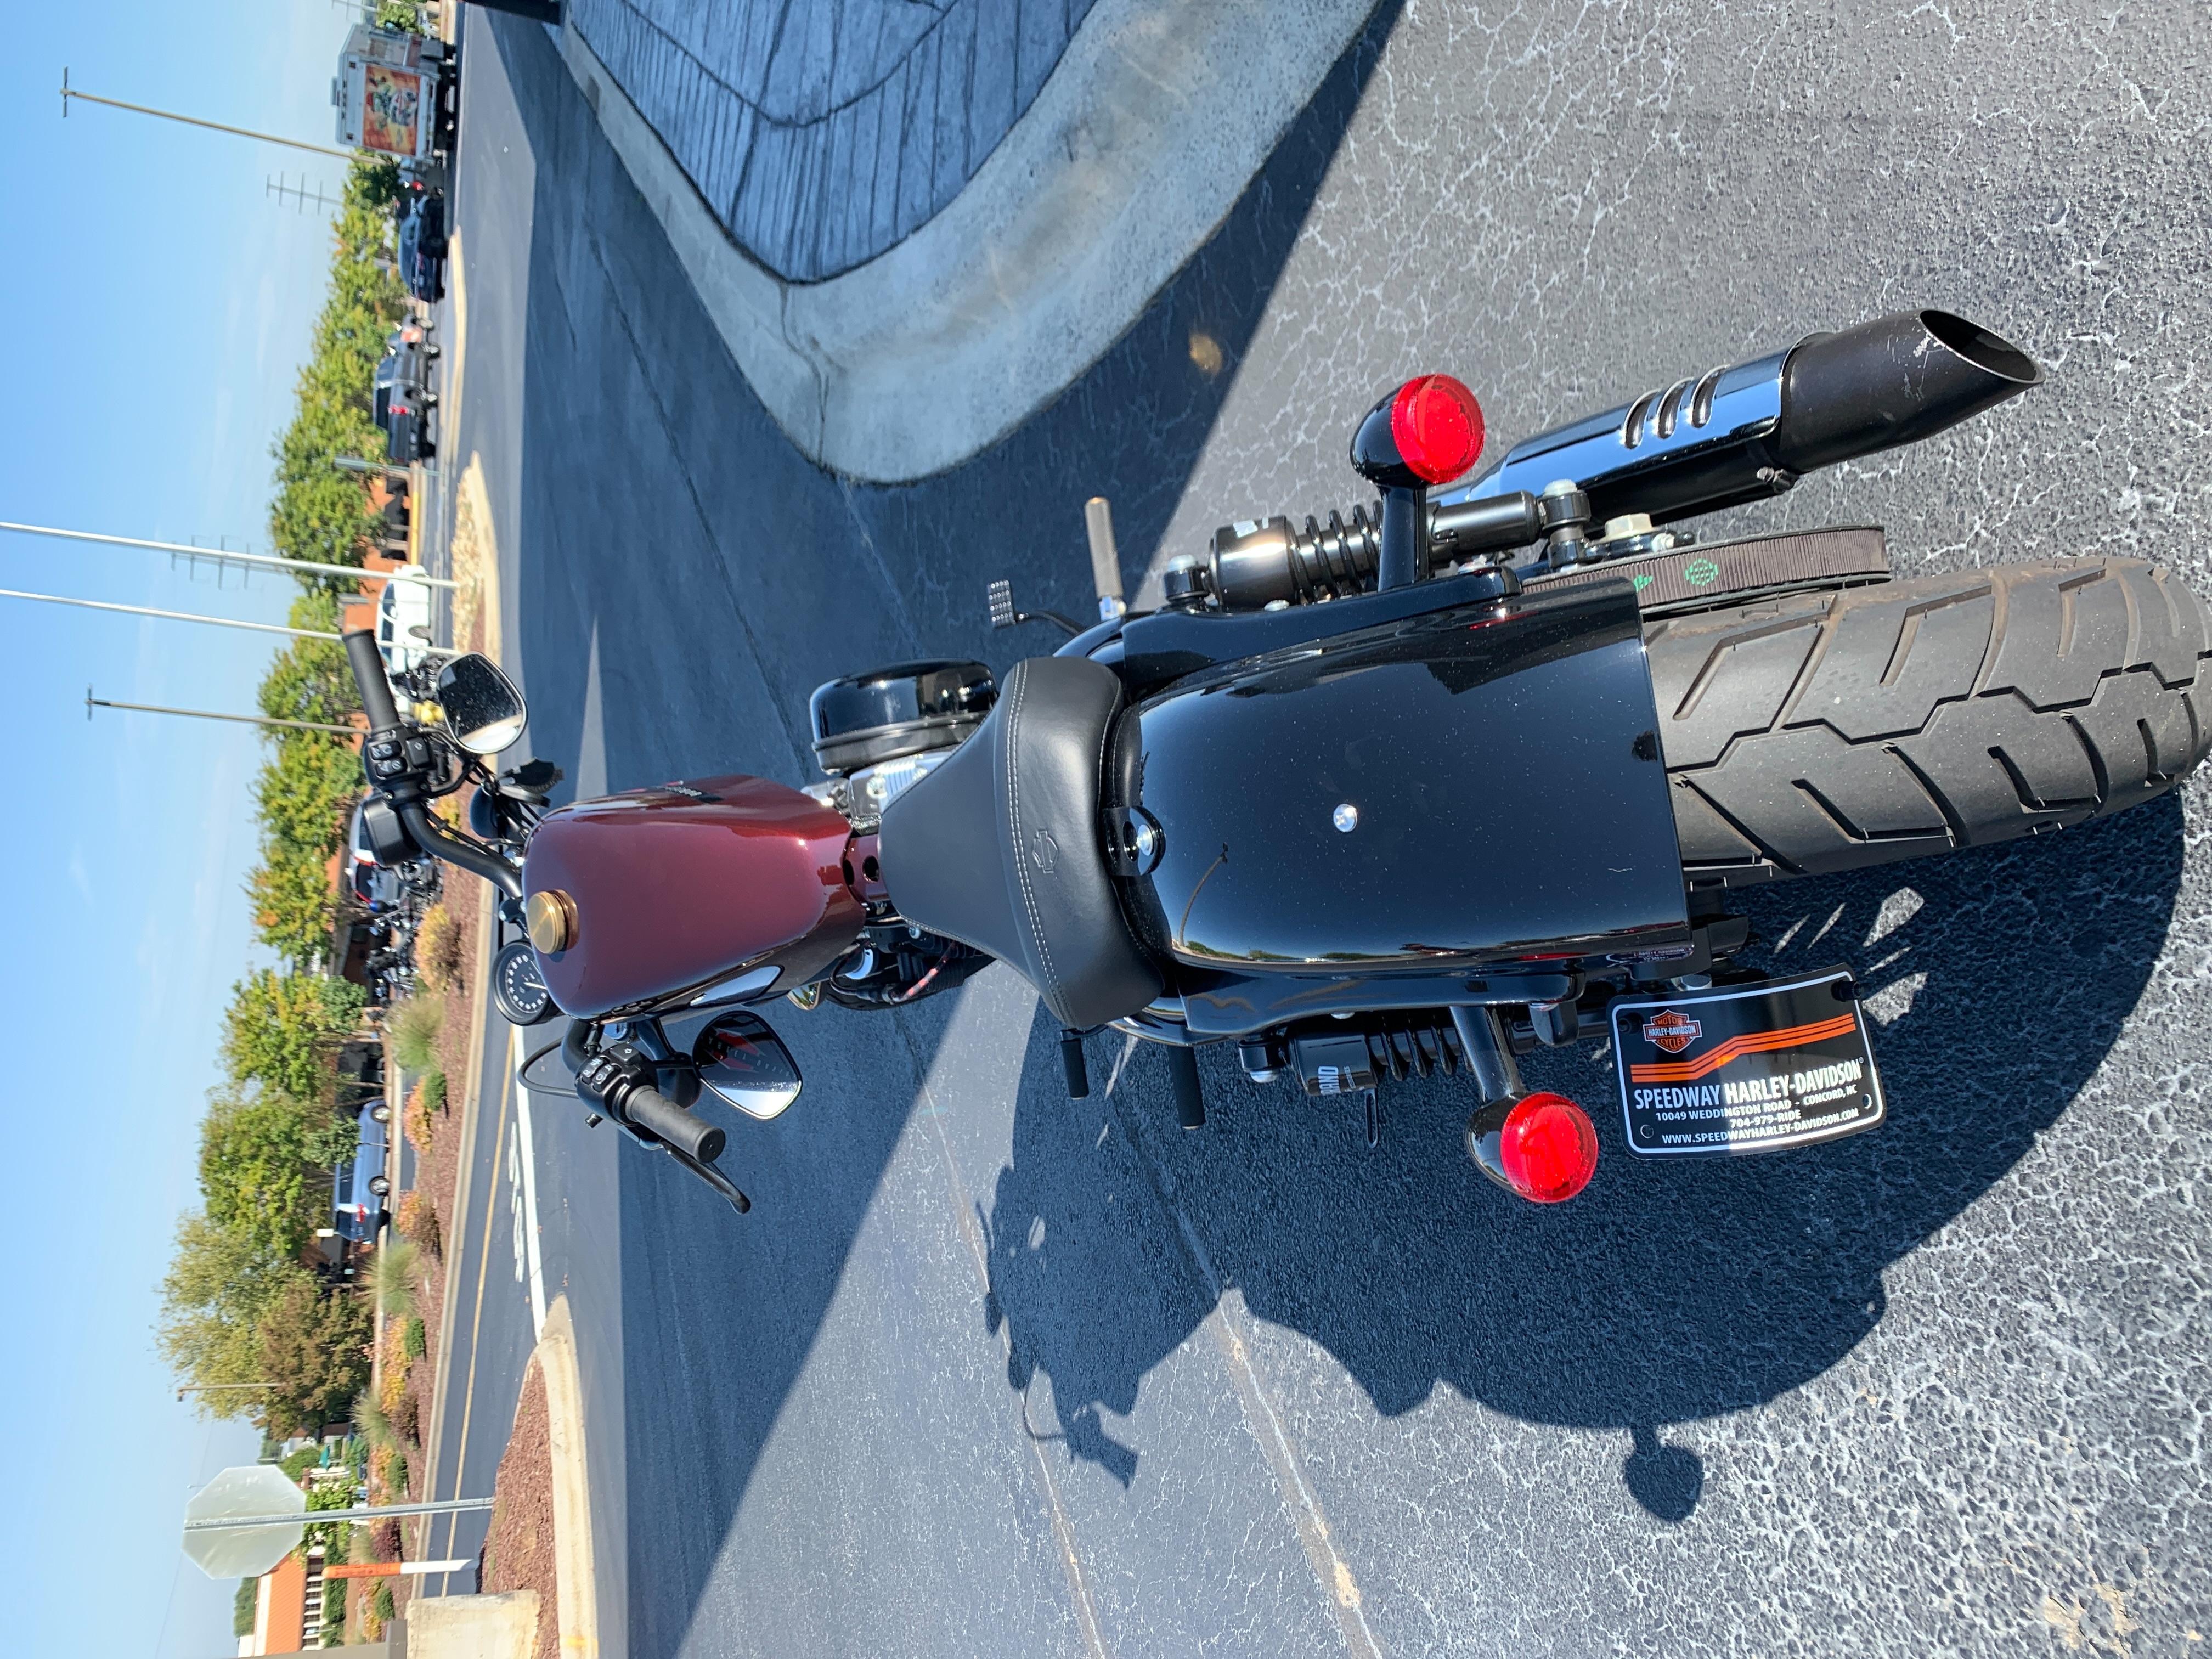 2021 Harley-Davidson Cruiser XL 1200X Forty-Eight at Speedway Harley-Davidson